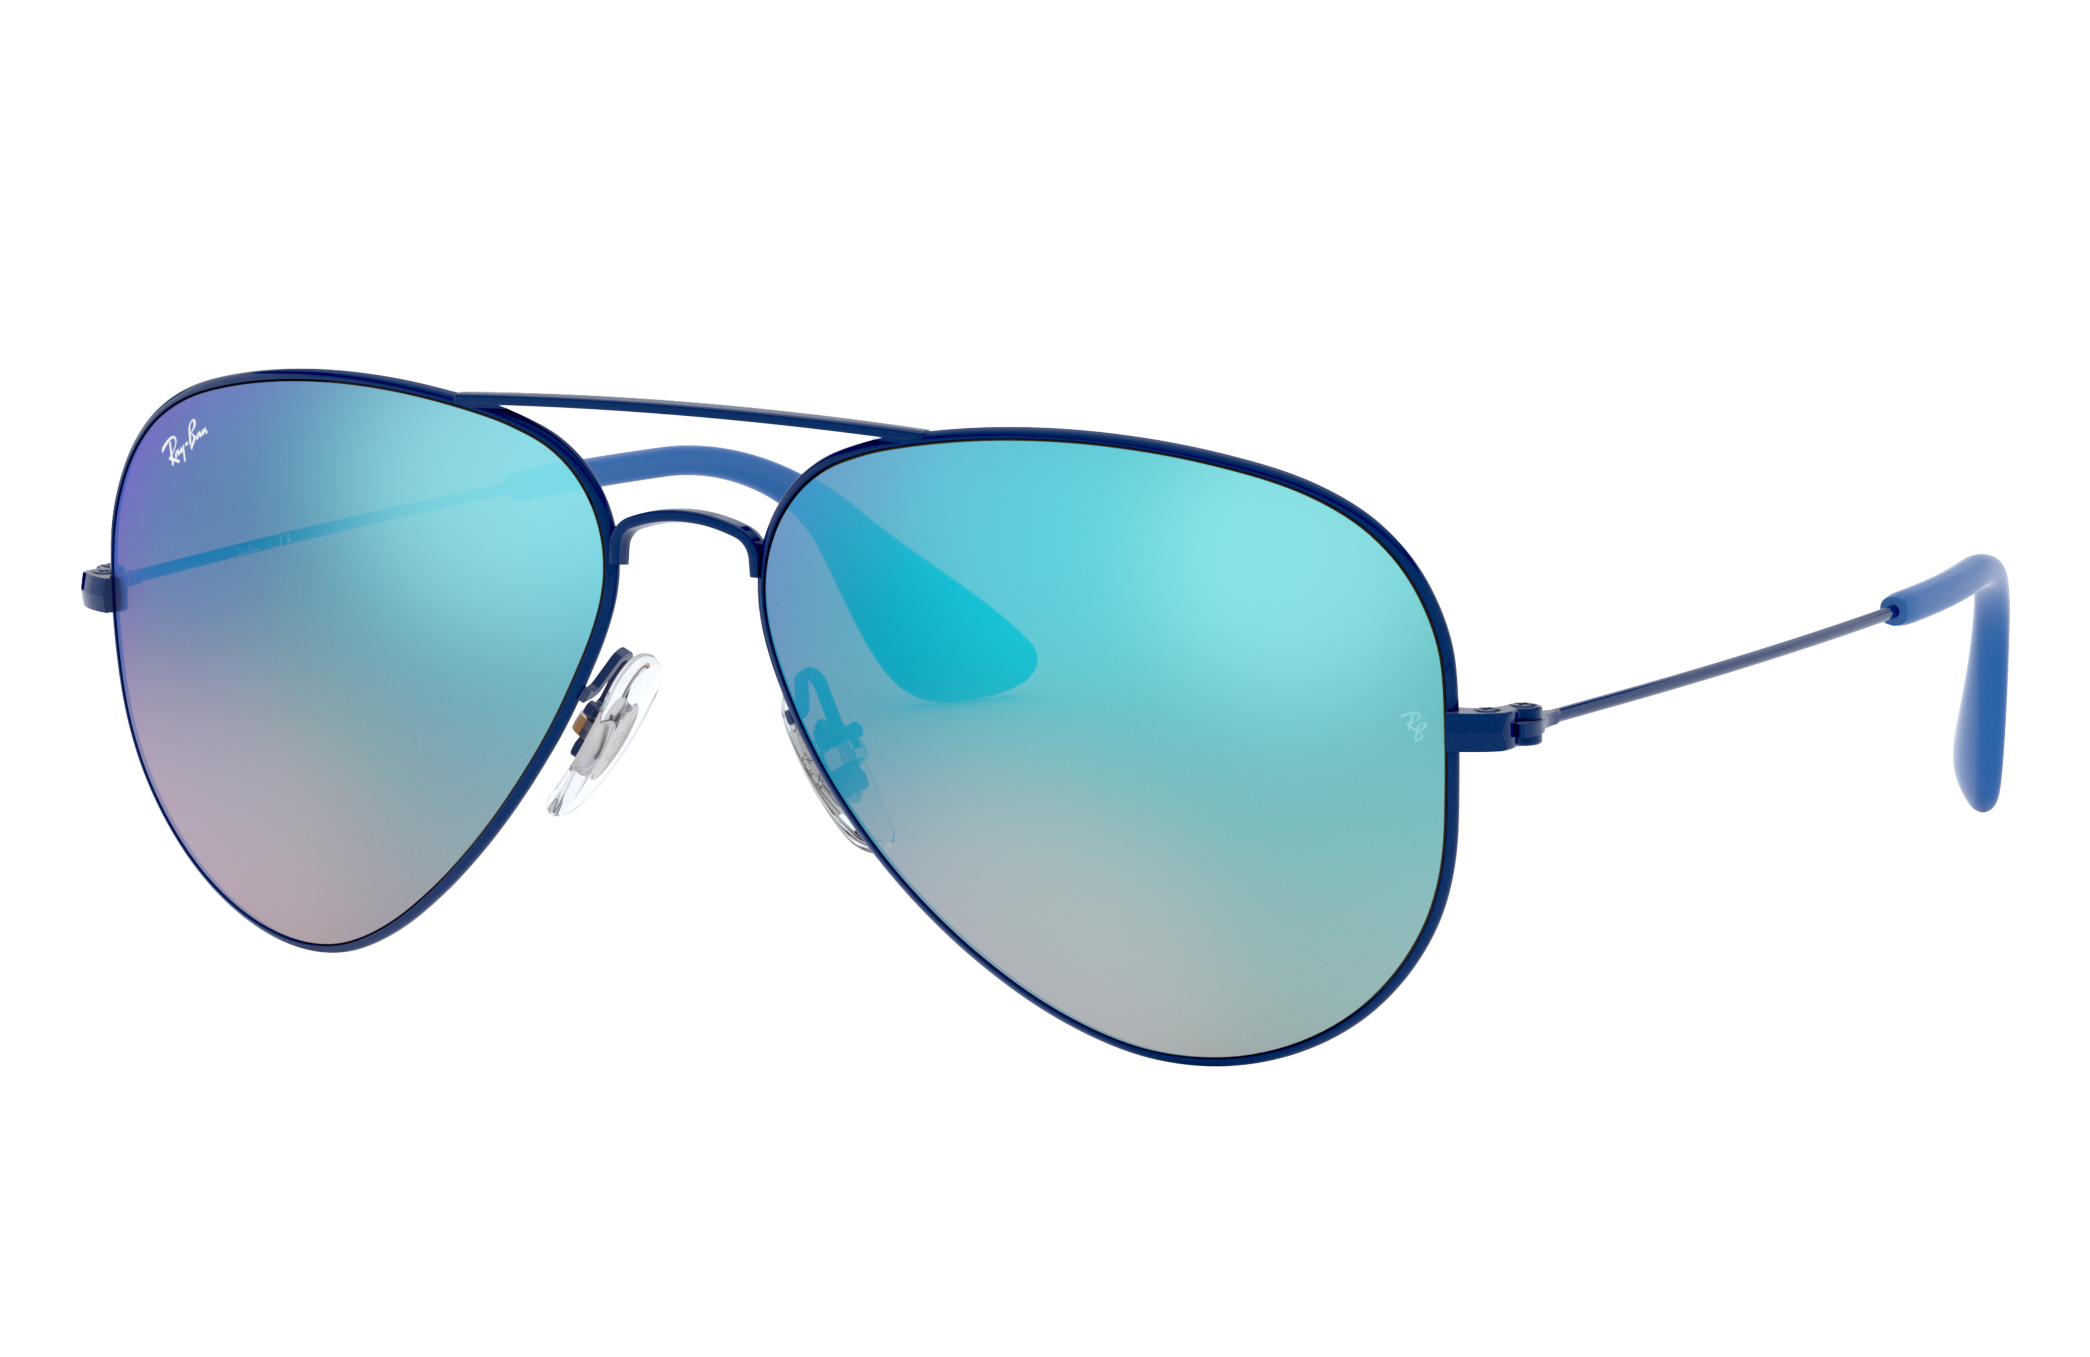 Ray-Ban Rb3558 Blue, Blue Lenses - RB3558